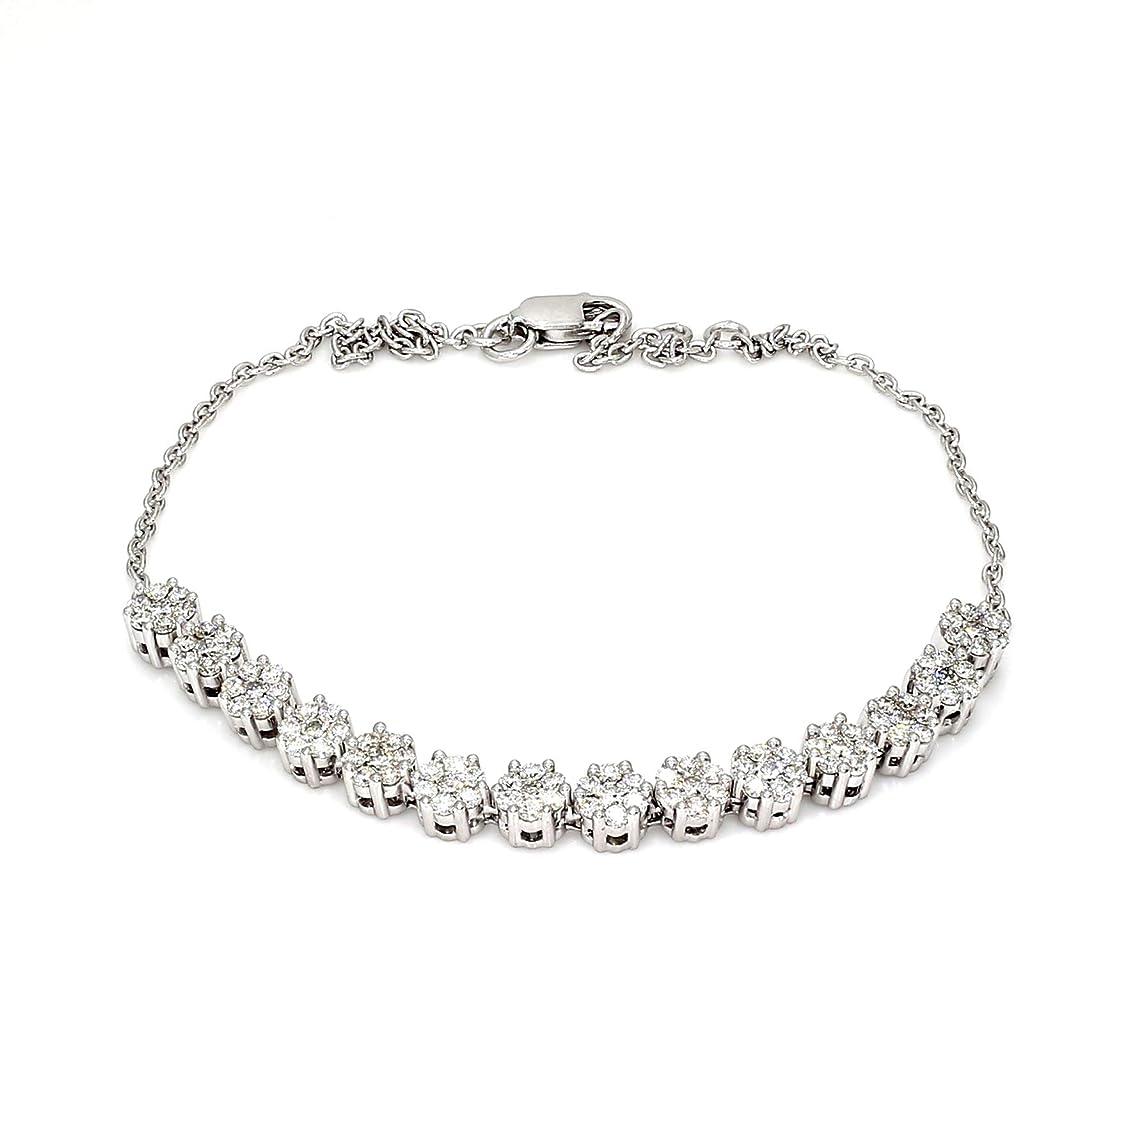 100% Diamond Ring 1 1/5 Carat Lab Grown Diamond Bracelet for Women Lab Created Diamond Bracelet SI-GH Quality 925 Silver Real Diamond Bracelet (Diamond Jewelry Gift for Women)